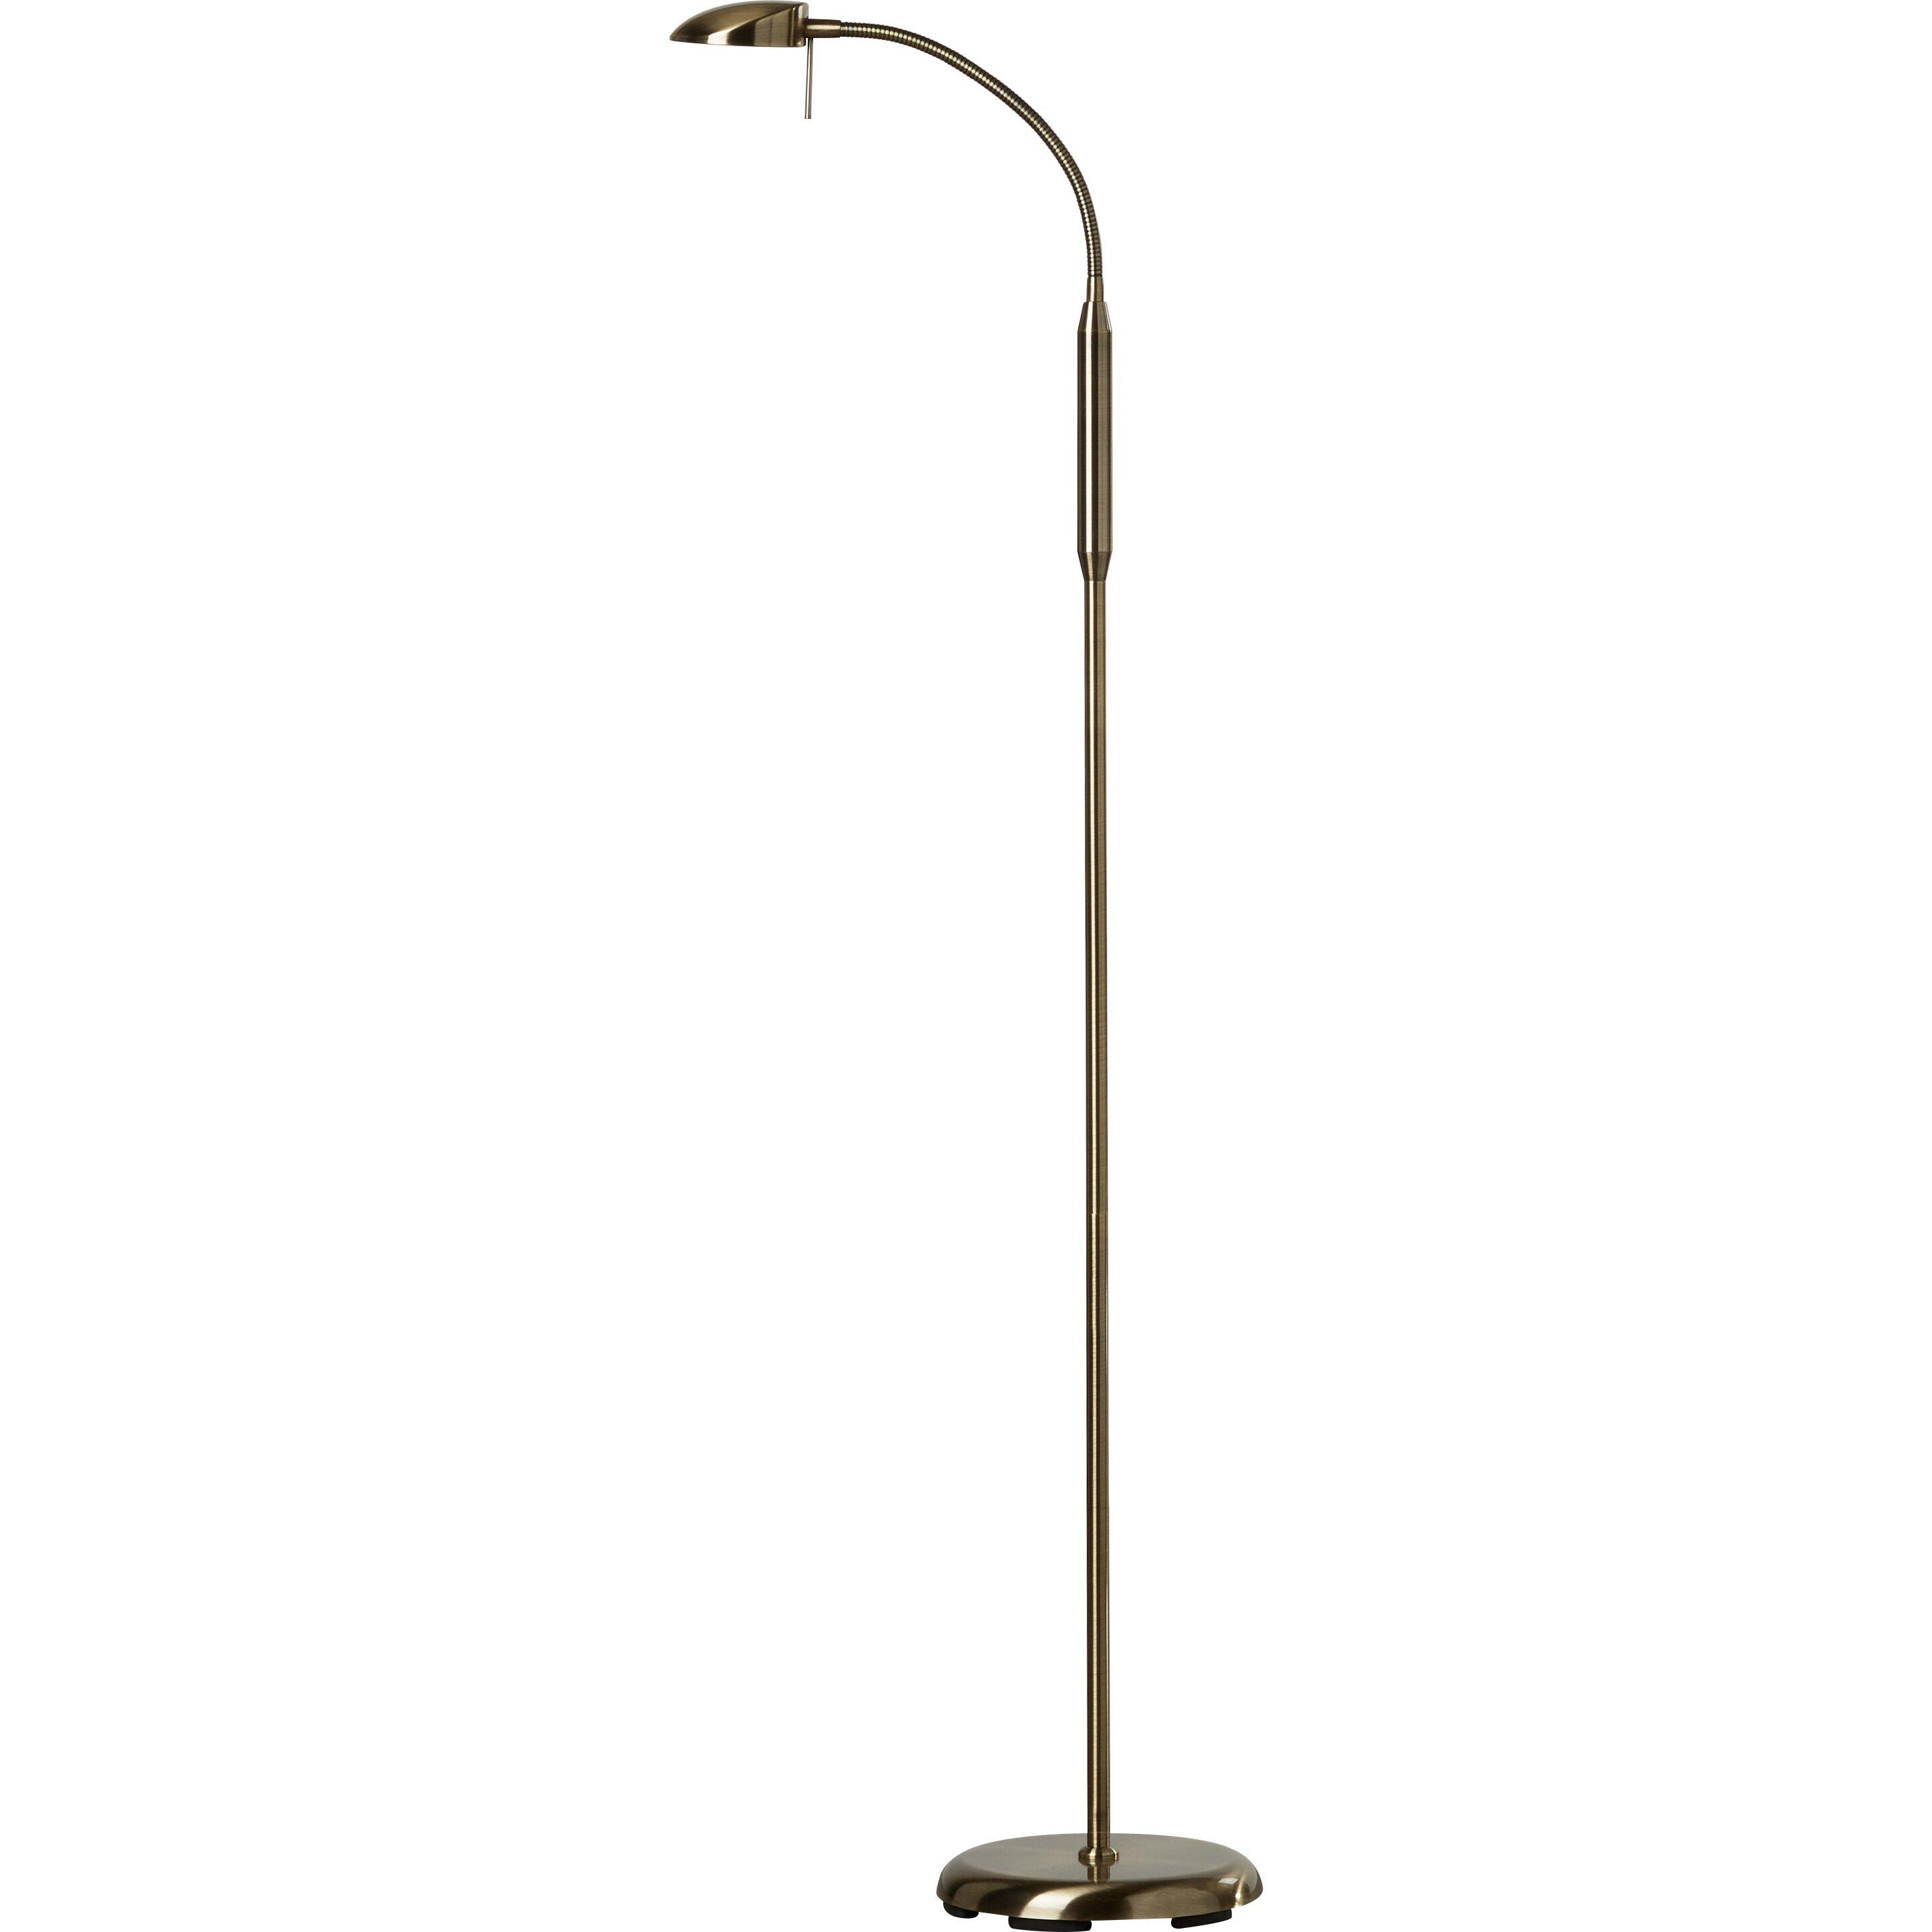 Riley ave tereza gooseneck 138cm reading floor lamp for Reading floor lamp reviews